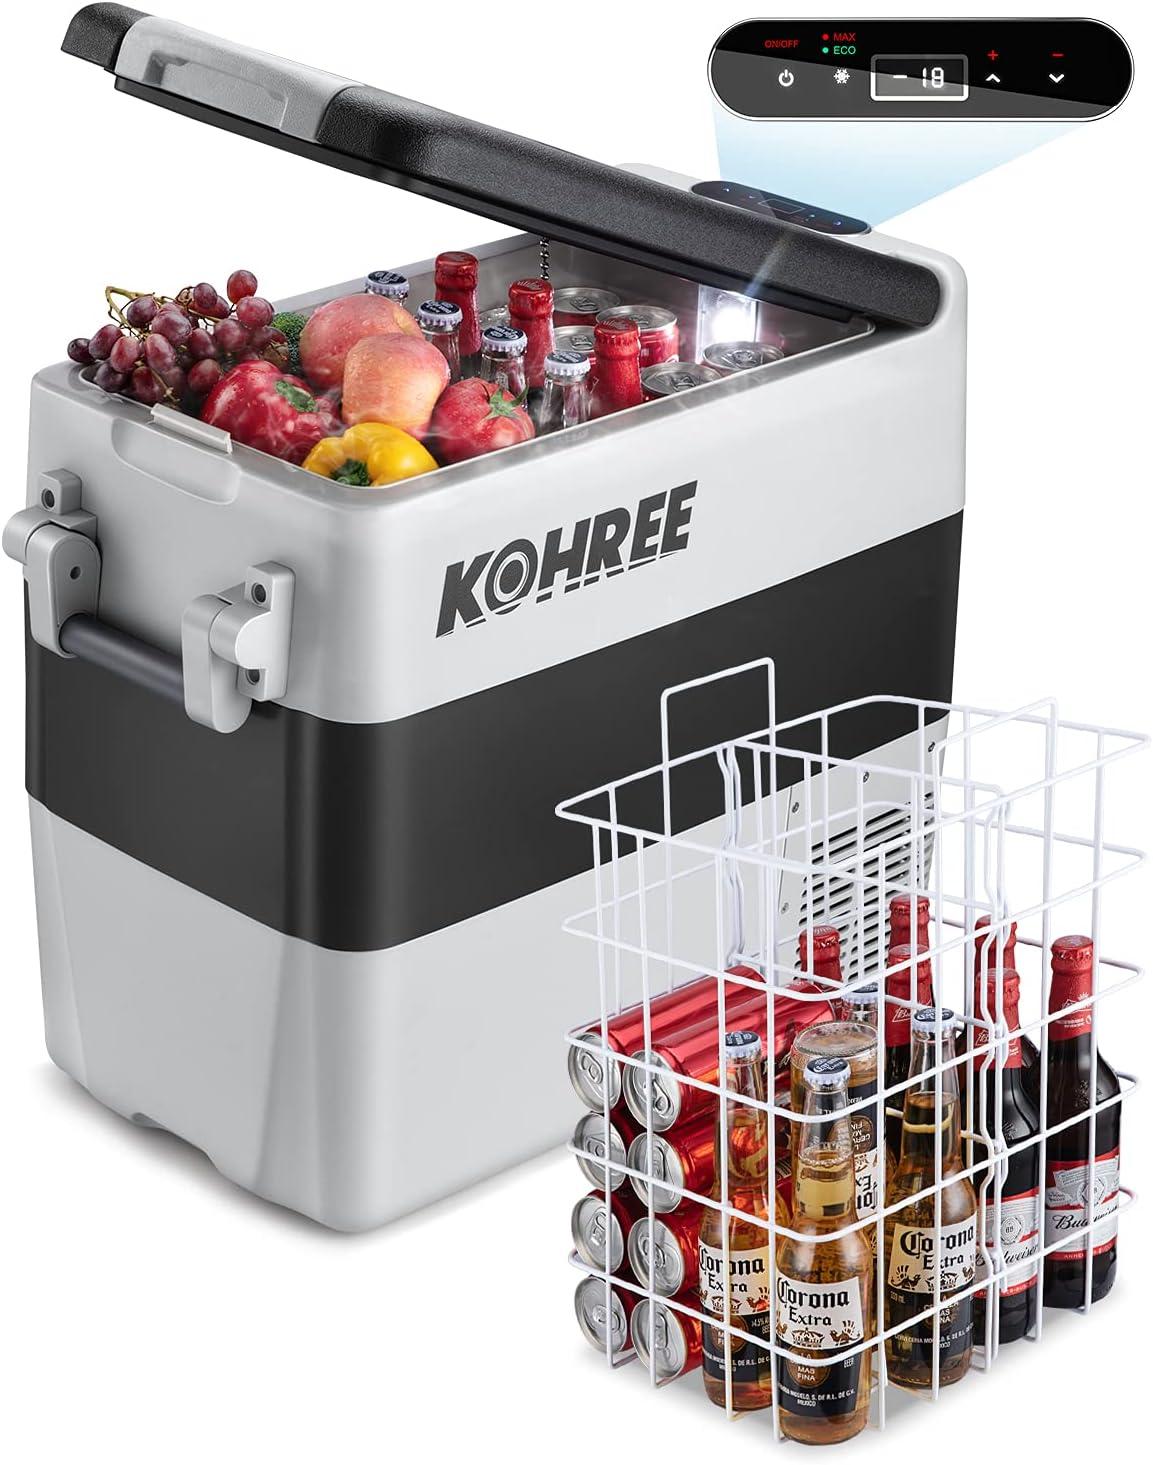 Kohree 12 Volt Refrigerator Portable Car fridge 53 Quart (50L) Dual Zone Fast Cooling Freezer (-4℉-50℉), Travel Electric Coolers for Truck, Vehicles, RV, Camping, Boat and Household-12V/24V DC and 110V/240V AC: Automotive